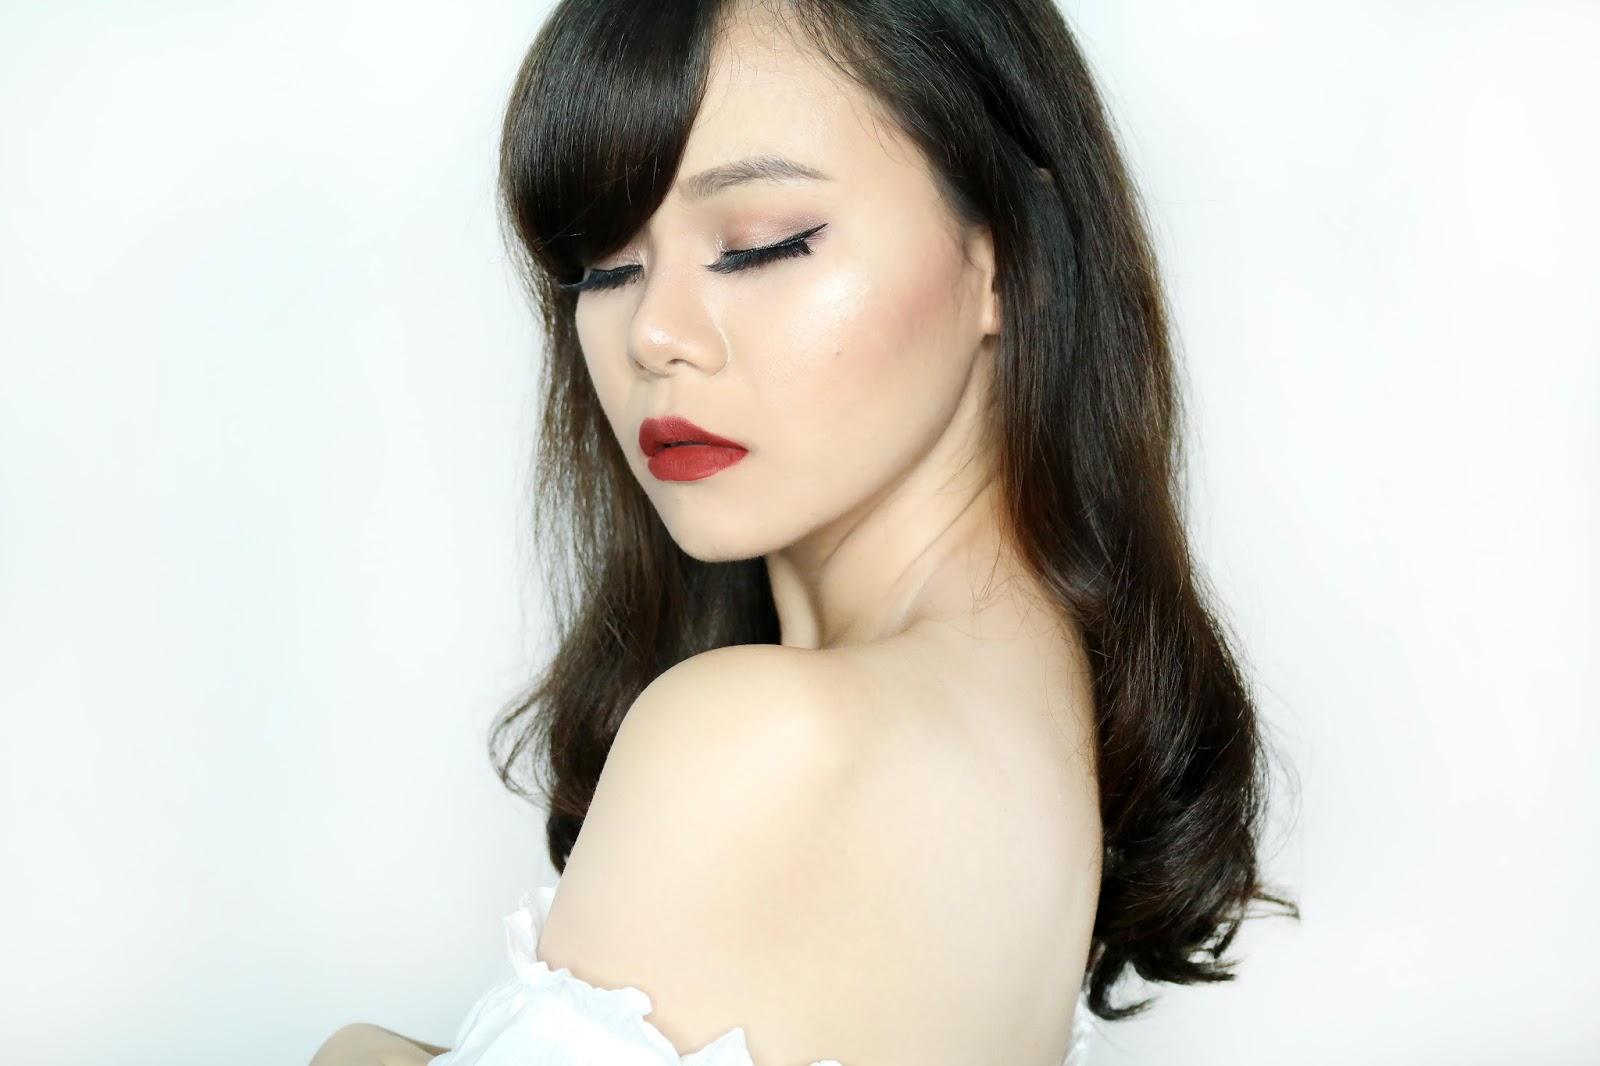 mizzu, mizzu cosmetics, mizzu valipcious, kosmetik indonesia, makeup lokal, matte lipstick, matte, matte lip cream, lip matte lokal, mizzu, mizzu makeup, drugstore, makeup murah